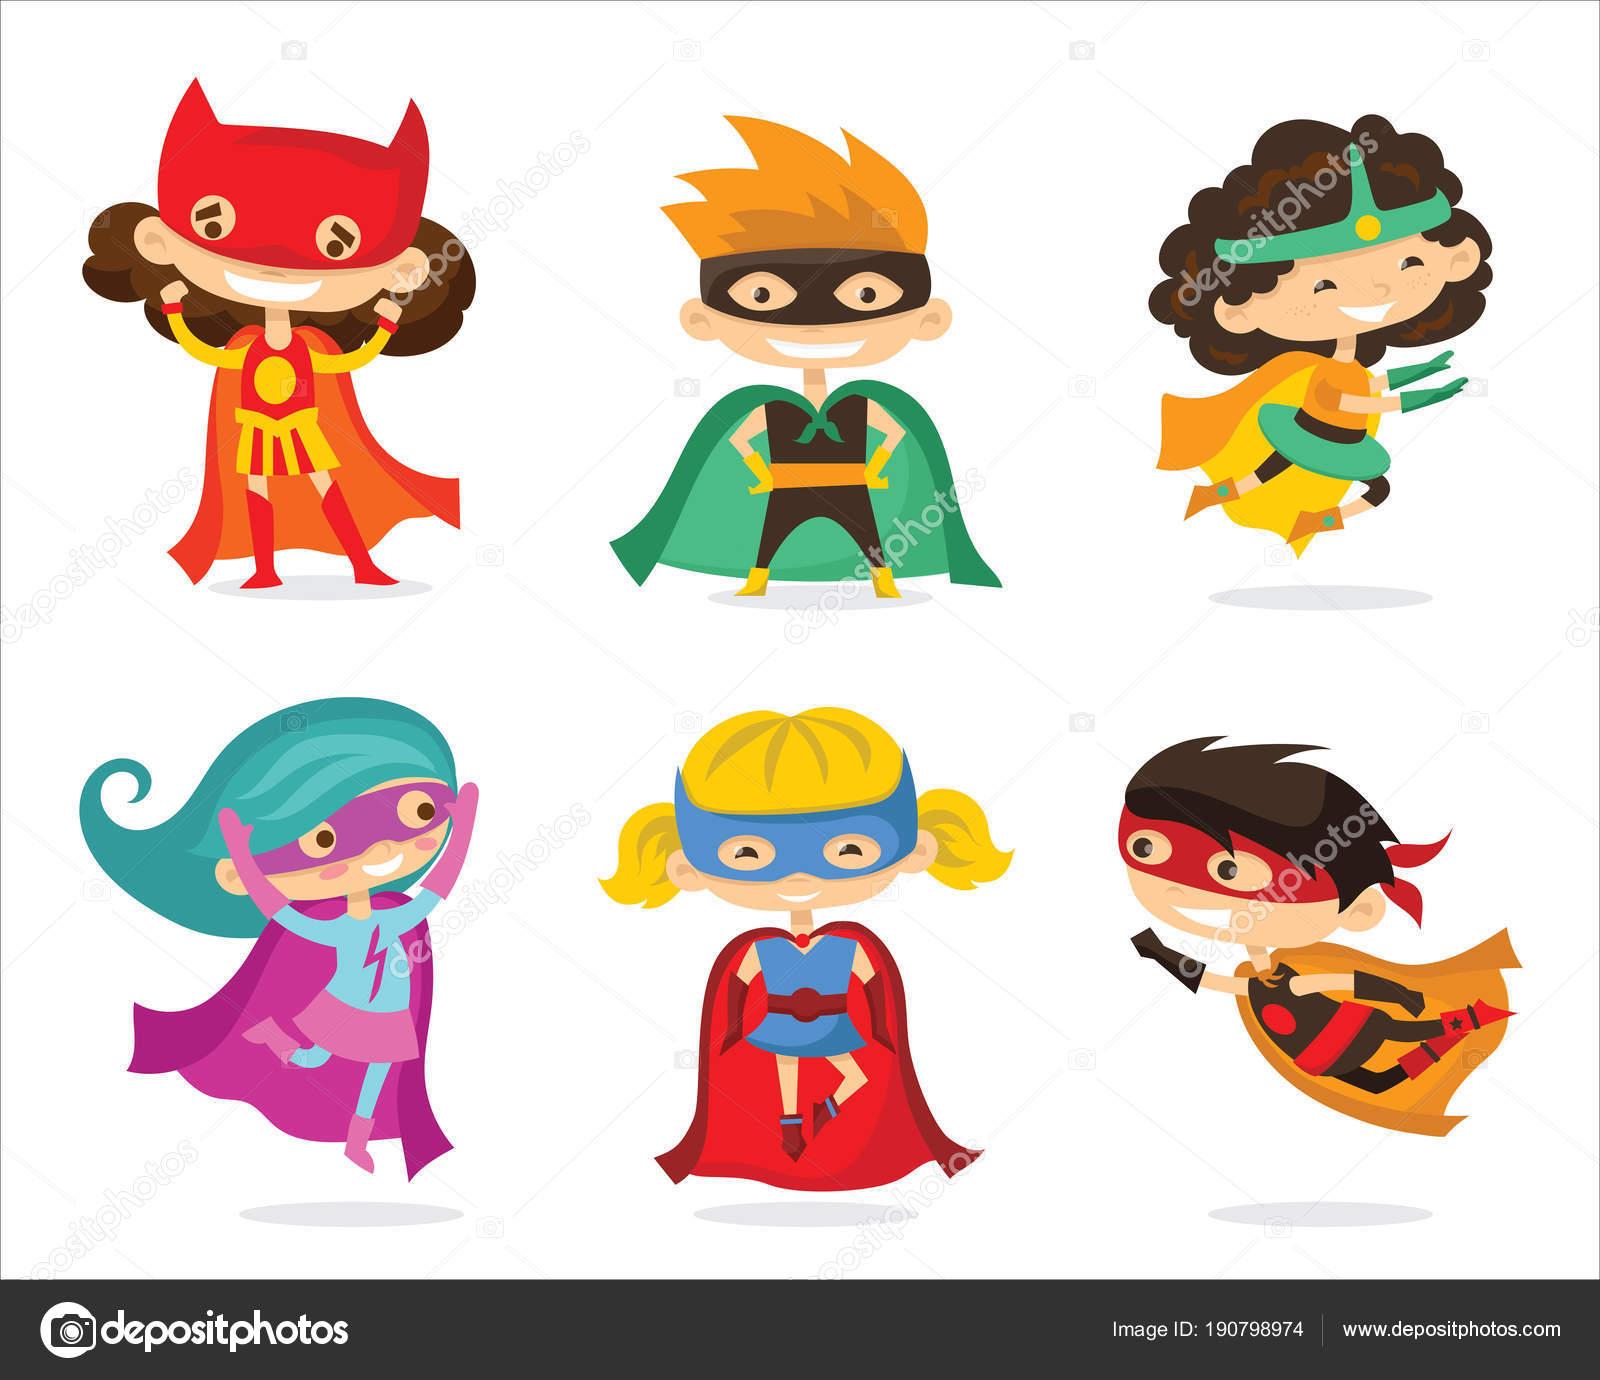 ilustraci u00f3n vector dibujos animados superheroes los ni u00f1os no homework pass clipart no homework pass clipart